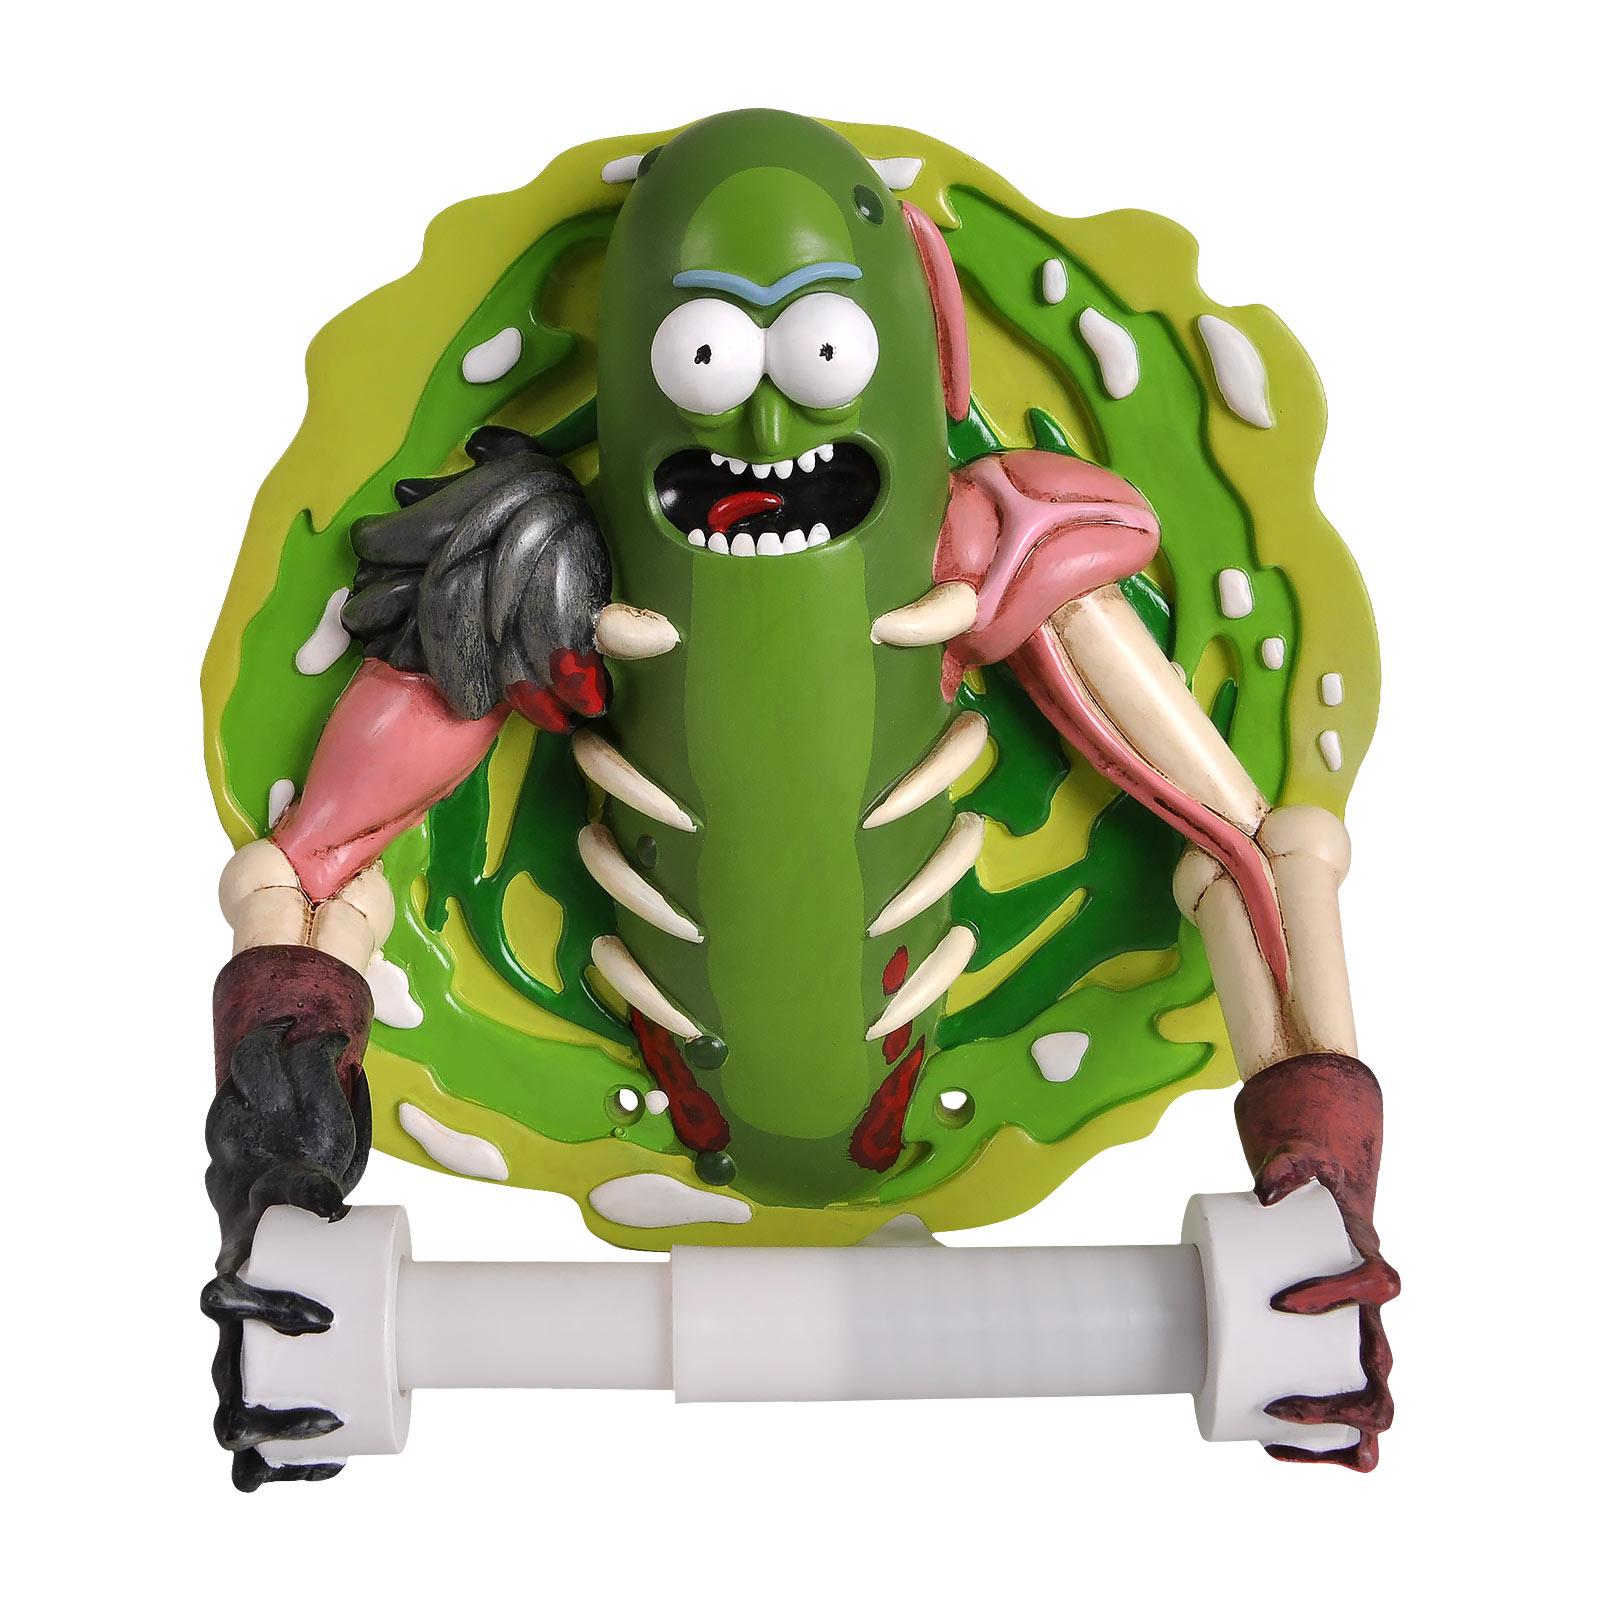 Rick and Morty - Pickle Rick Toilettenpapierhalter